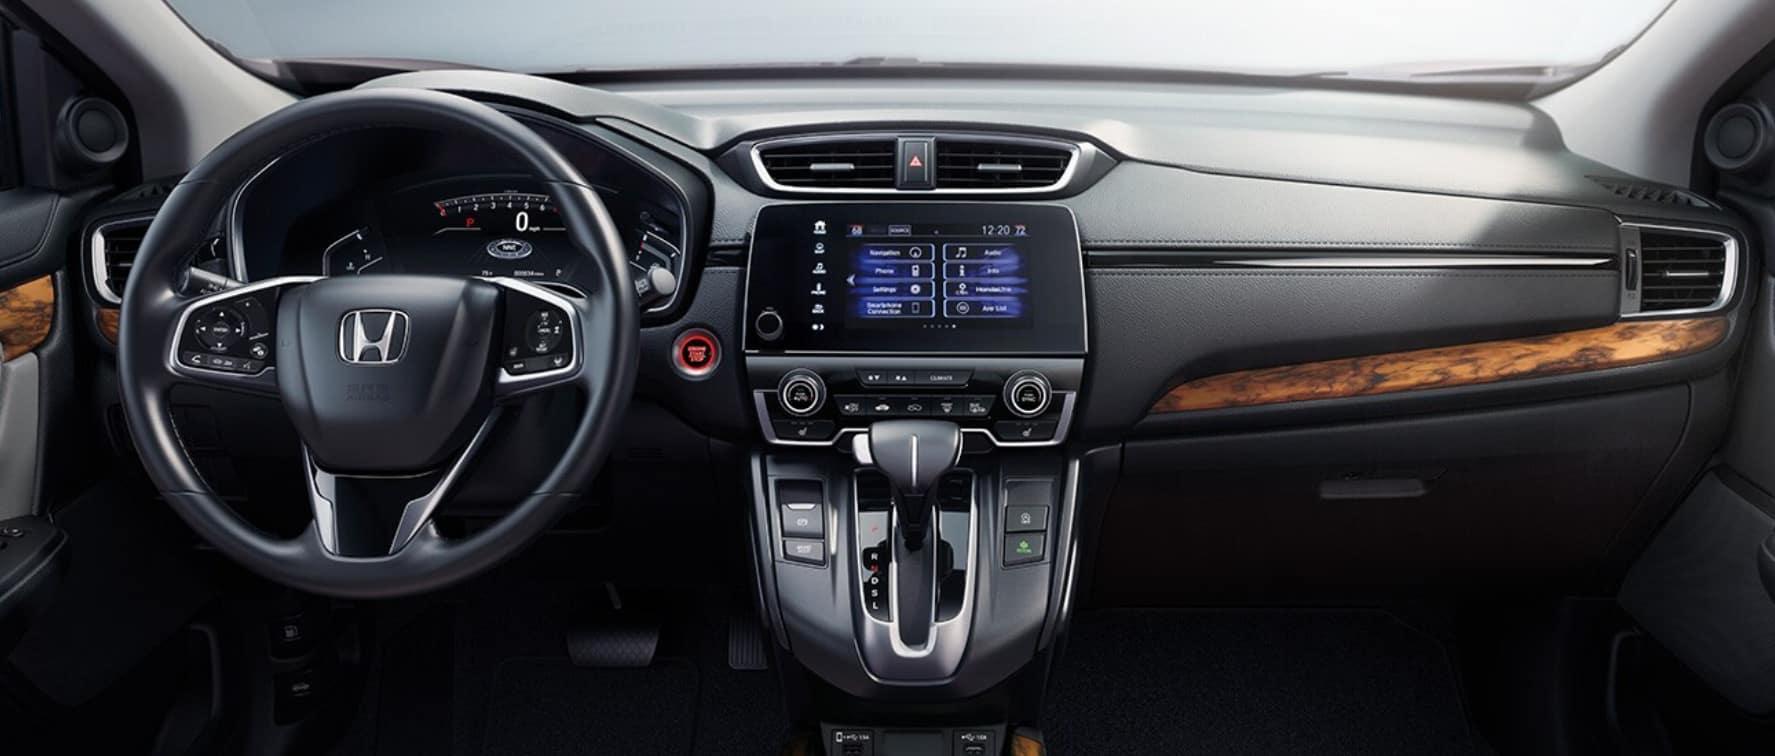 interior of a 2020 honda cr-v available now at schaller honda of new britain